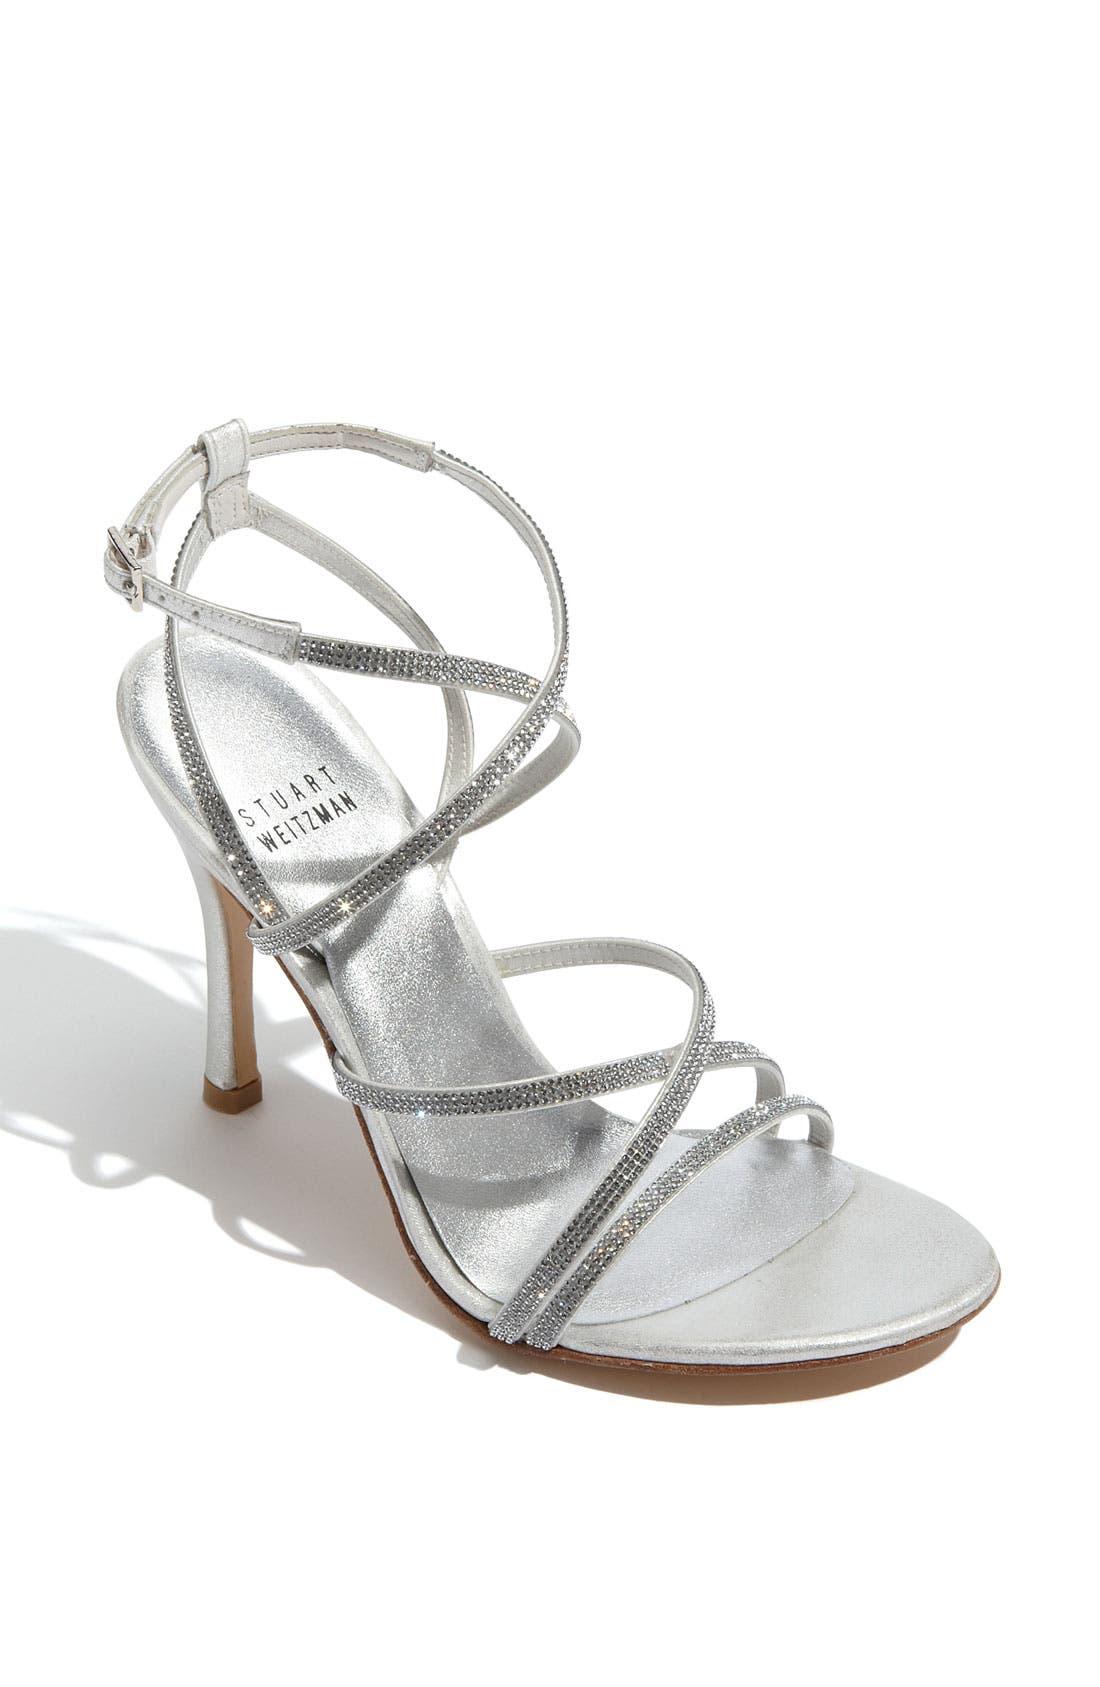 Alternate Image 1 Selected - Stuart Weitzman 'Gemex' Sandal